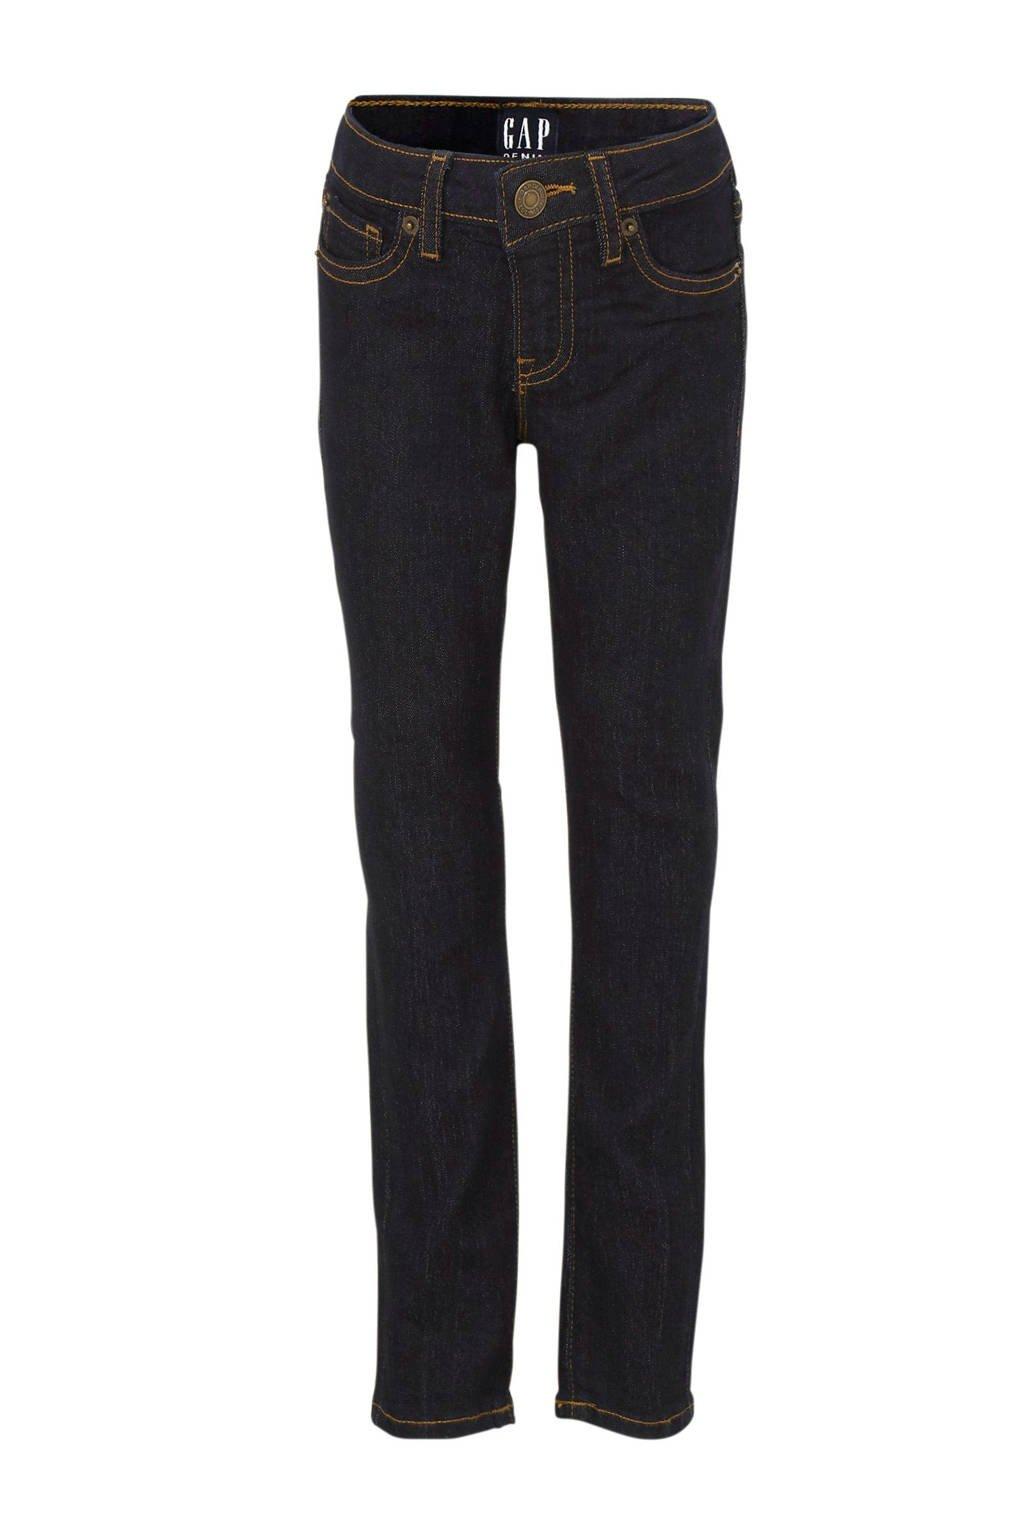 GAP skinny jeans dark denim, Dark denim